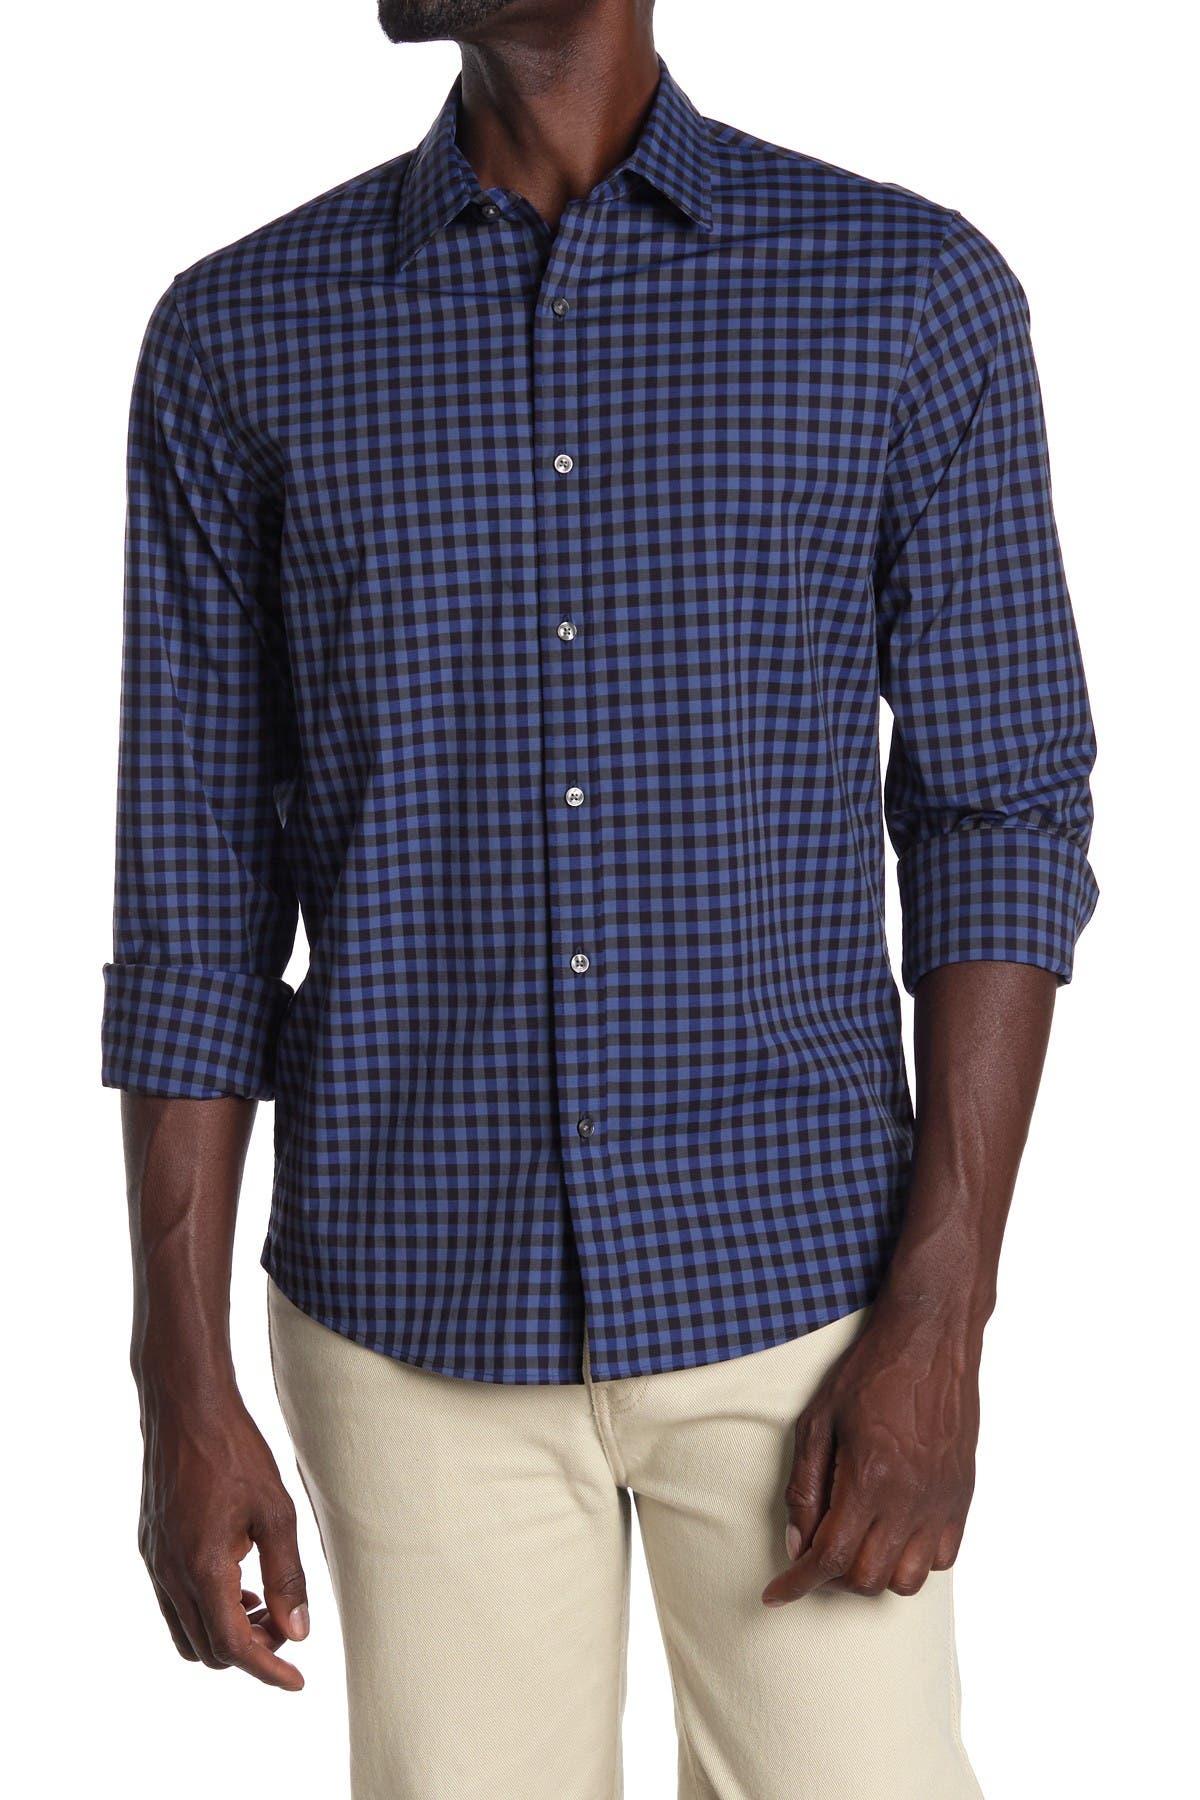 Image of Michael Kors Brady Gingham Check Slim Fit Shirt